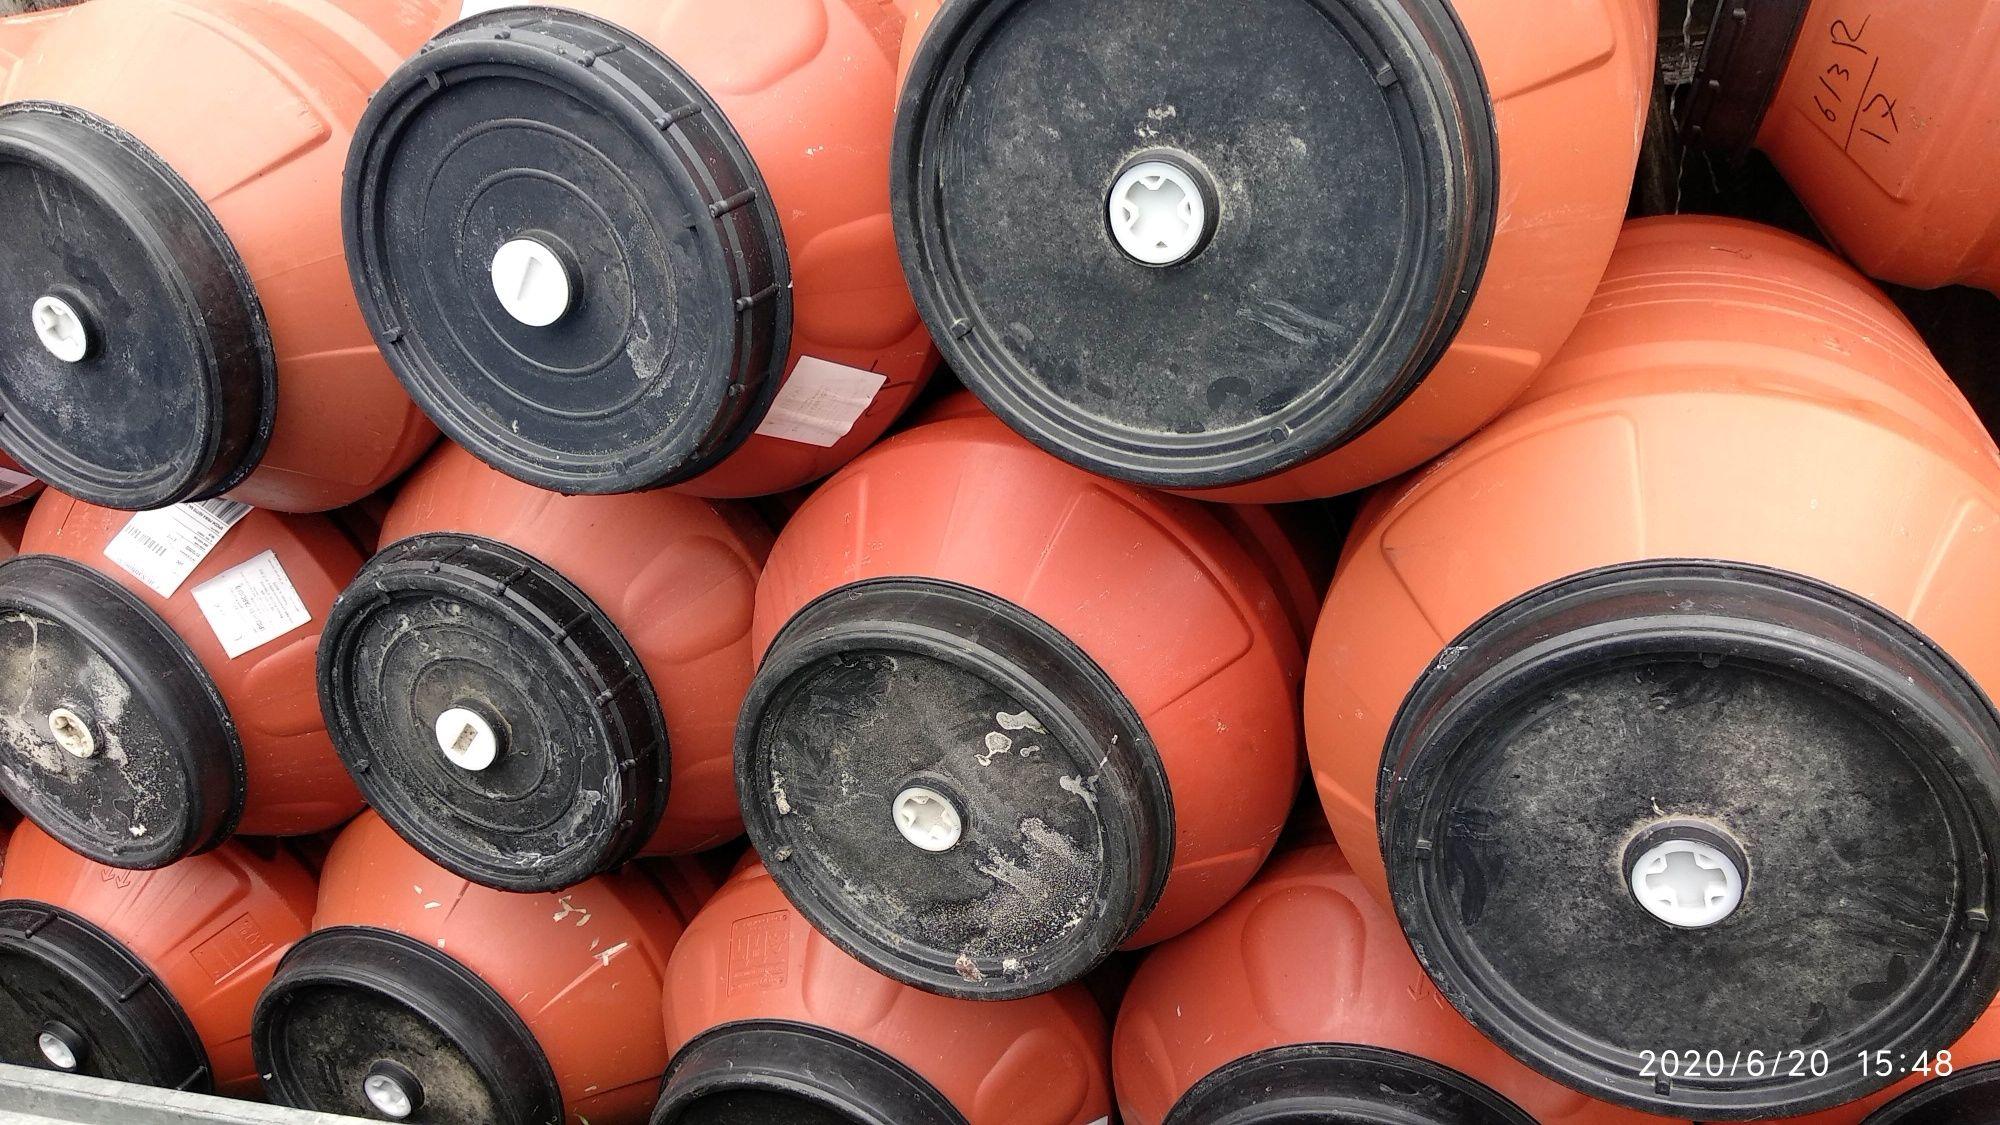 Butoaie plastic gros 220 litri butoi cu capac mare alimentare